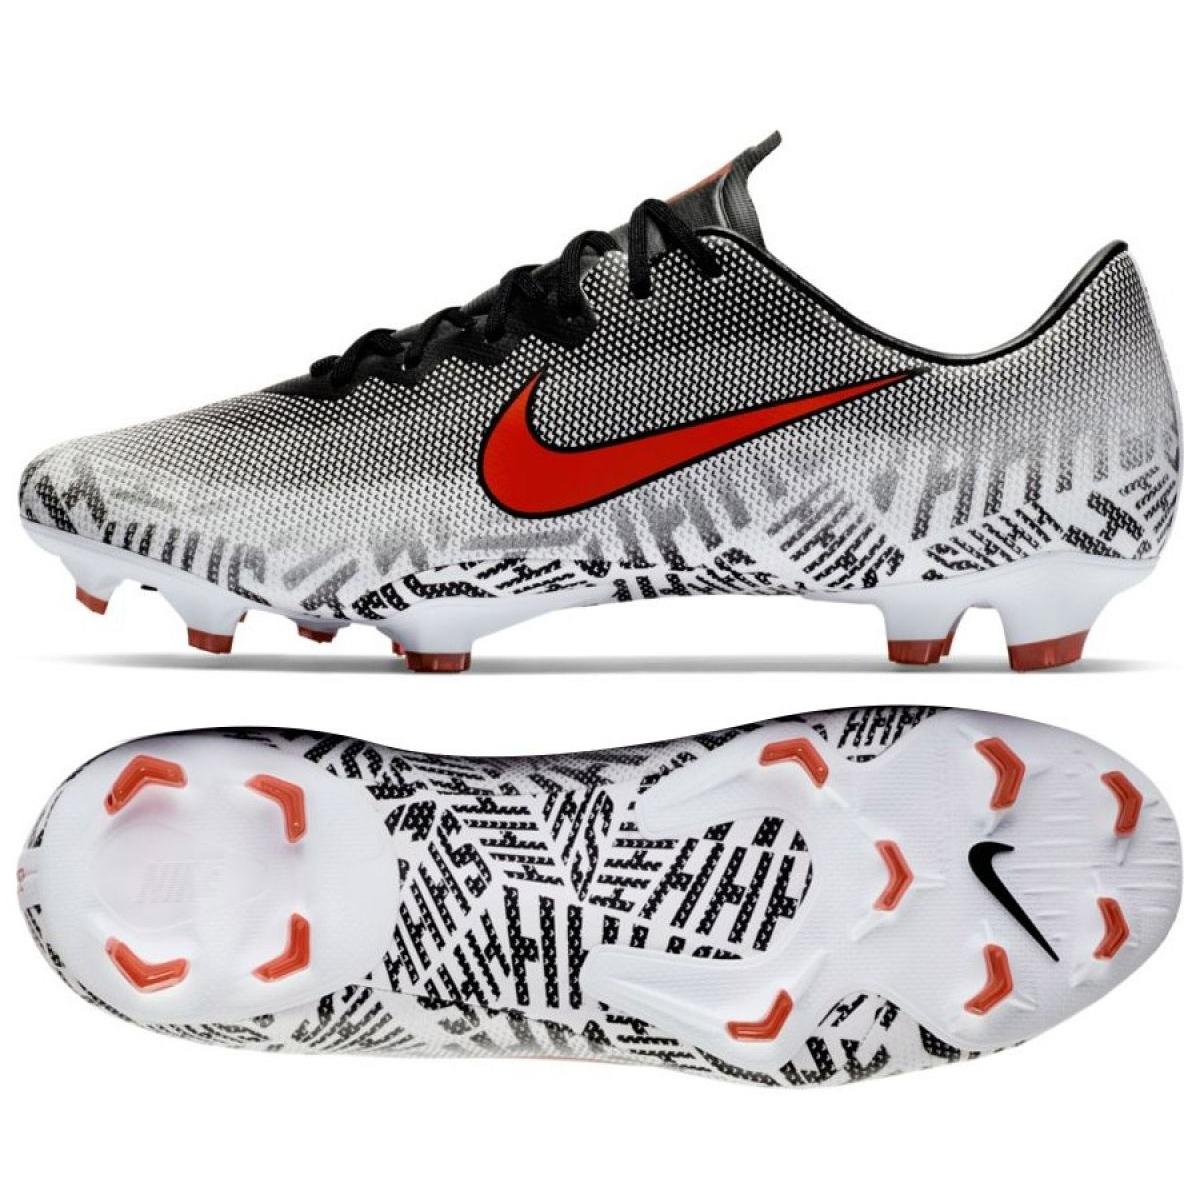 Zapatos de fútbol Nike Mercurial Vapor XIII Elite AG Pro Neymar Jr